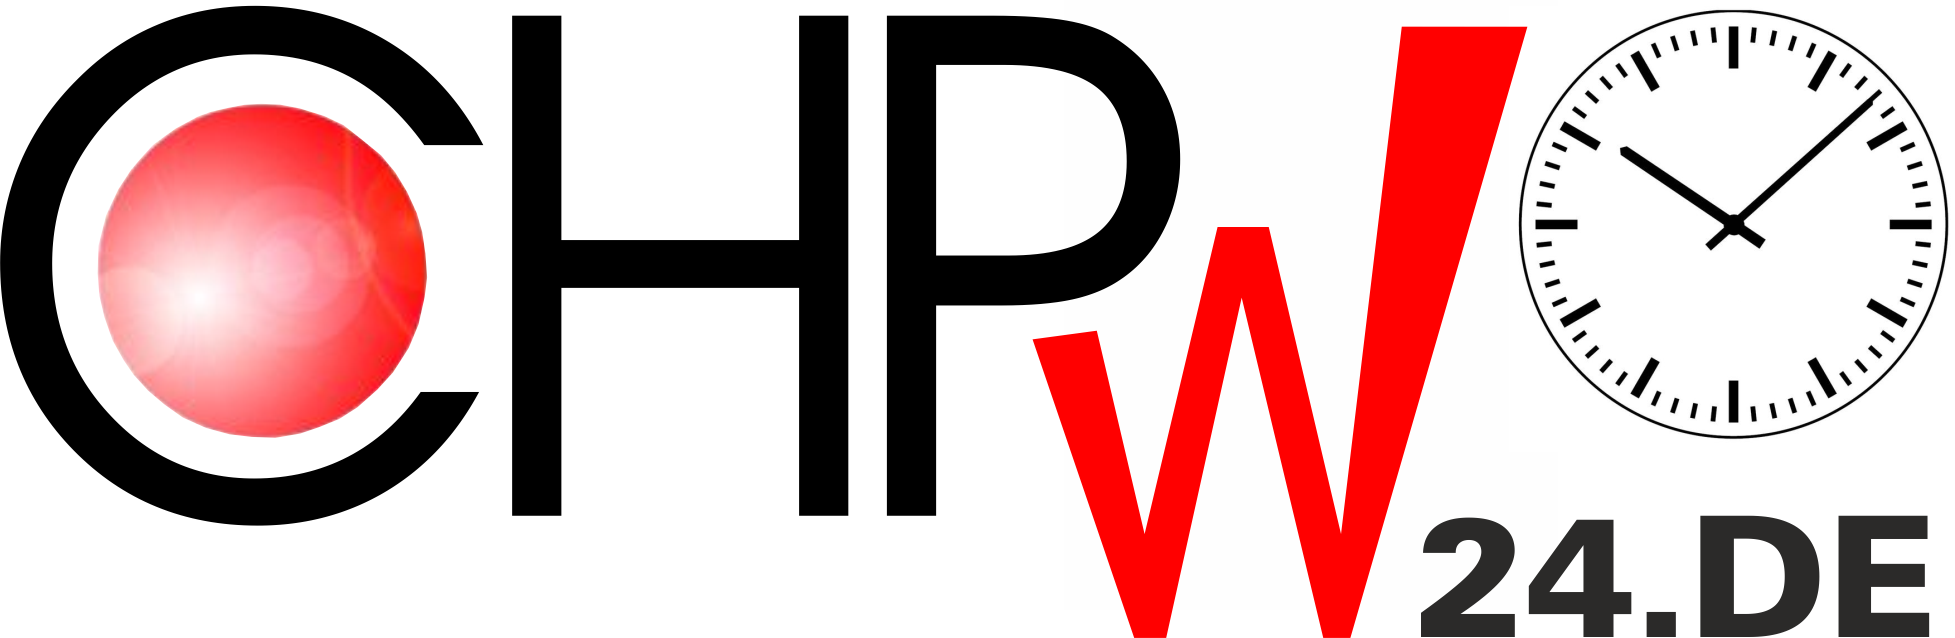 CHPW24-Logo